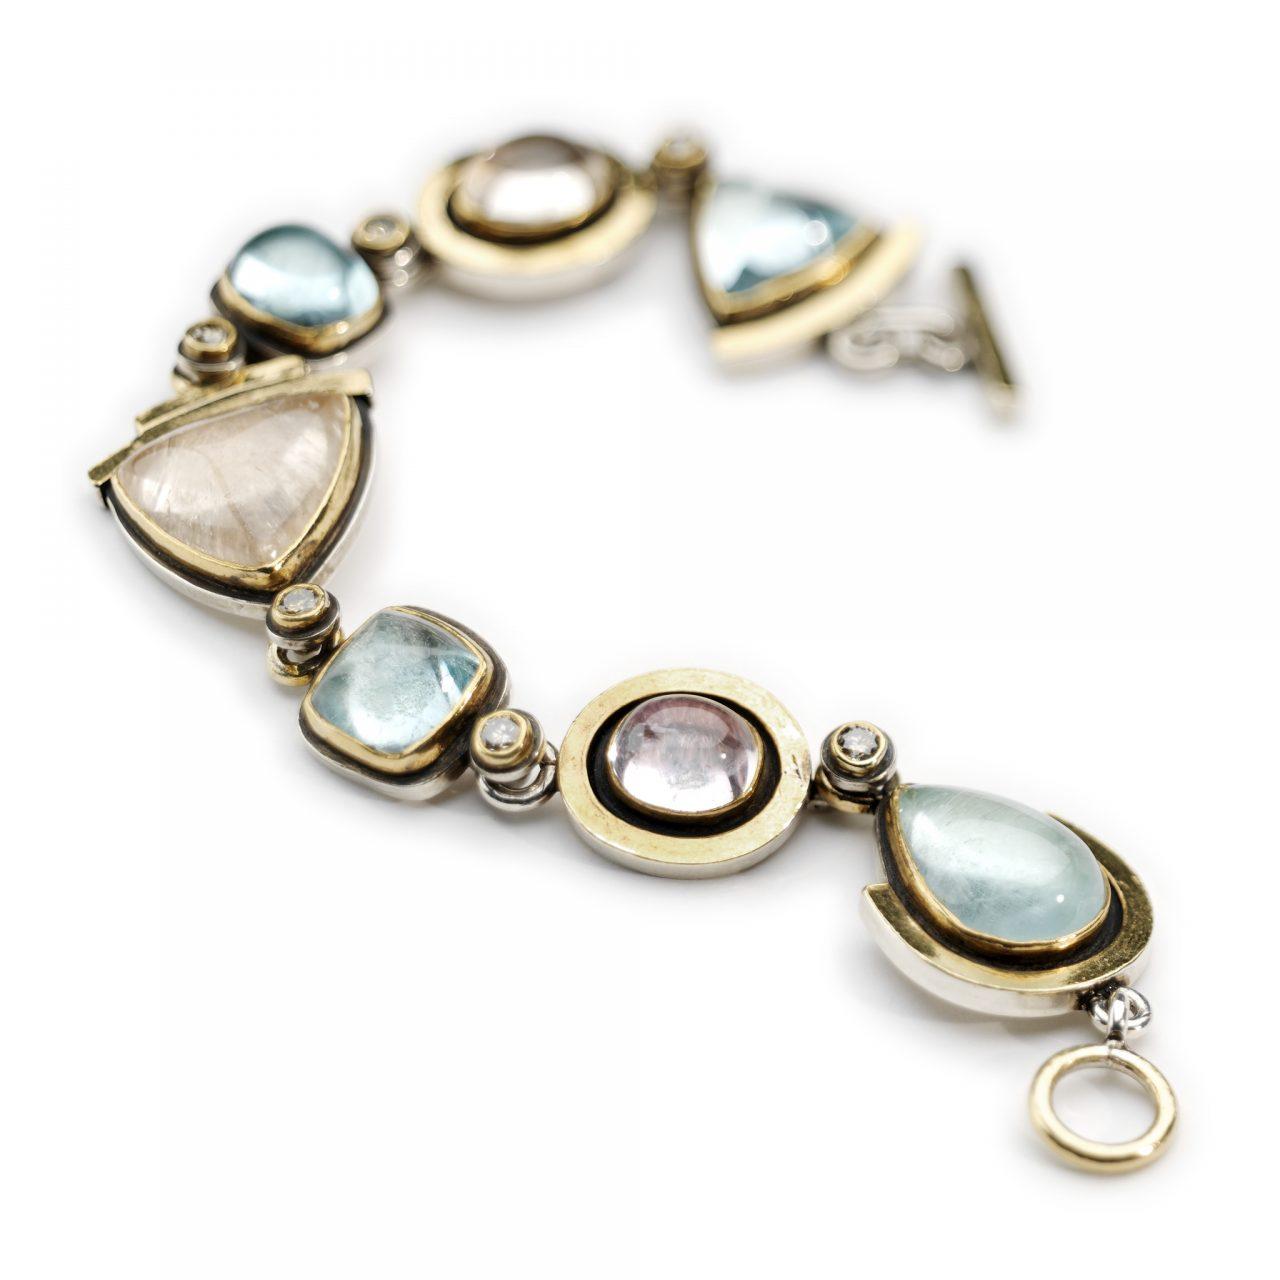 Aquamarine, Tourmaline and Diamond Bracelet